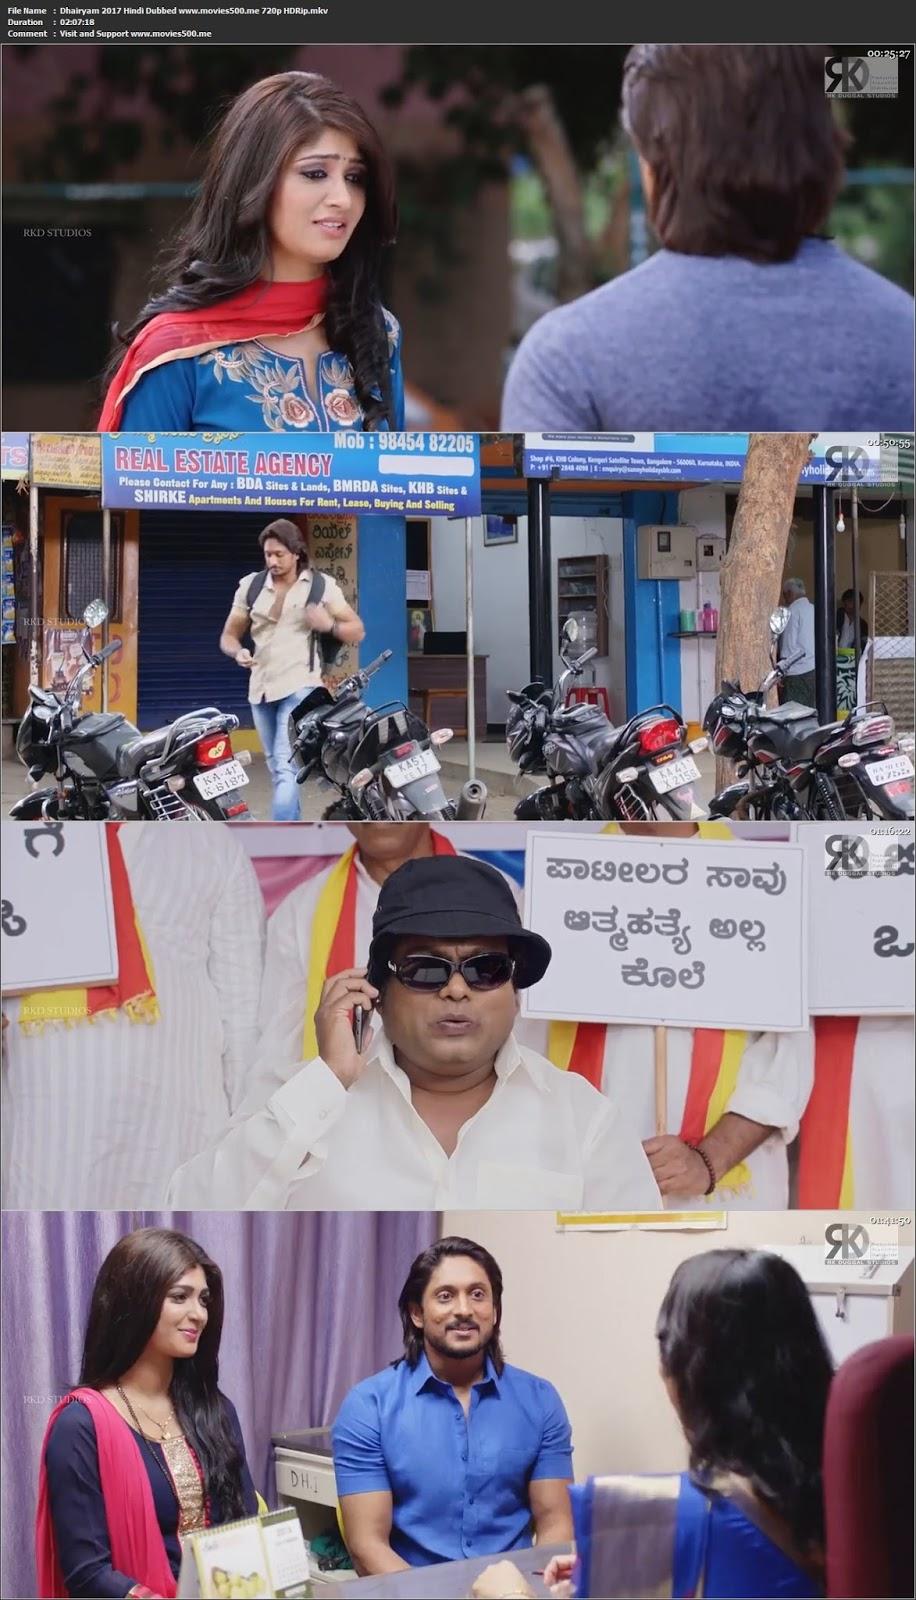 Dhairyam 2017 Hindi Dubbed Full Movie HDRip 720p at softwaresonly.com